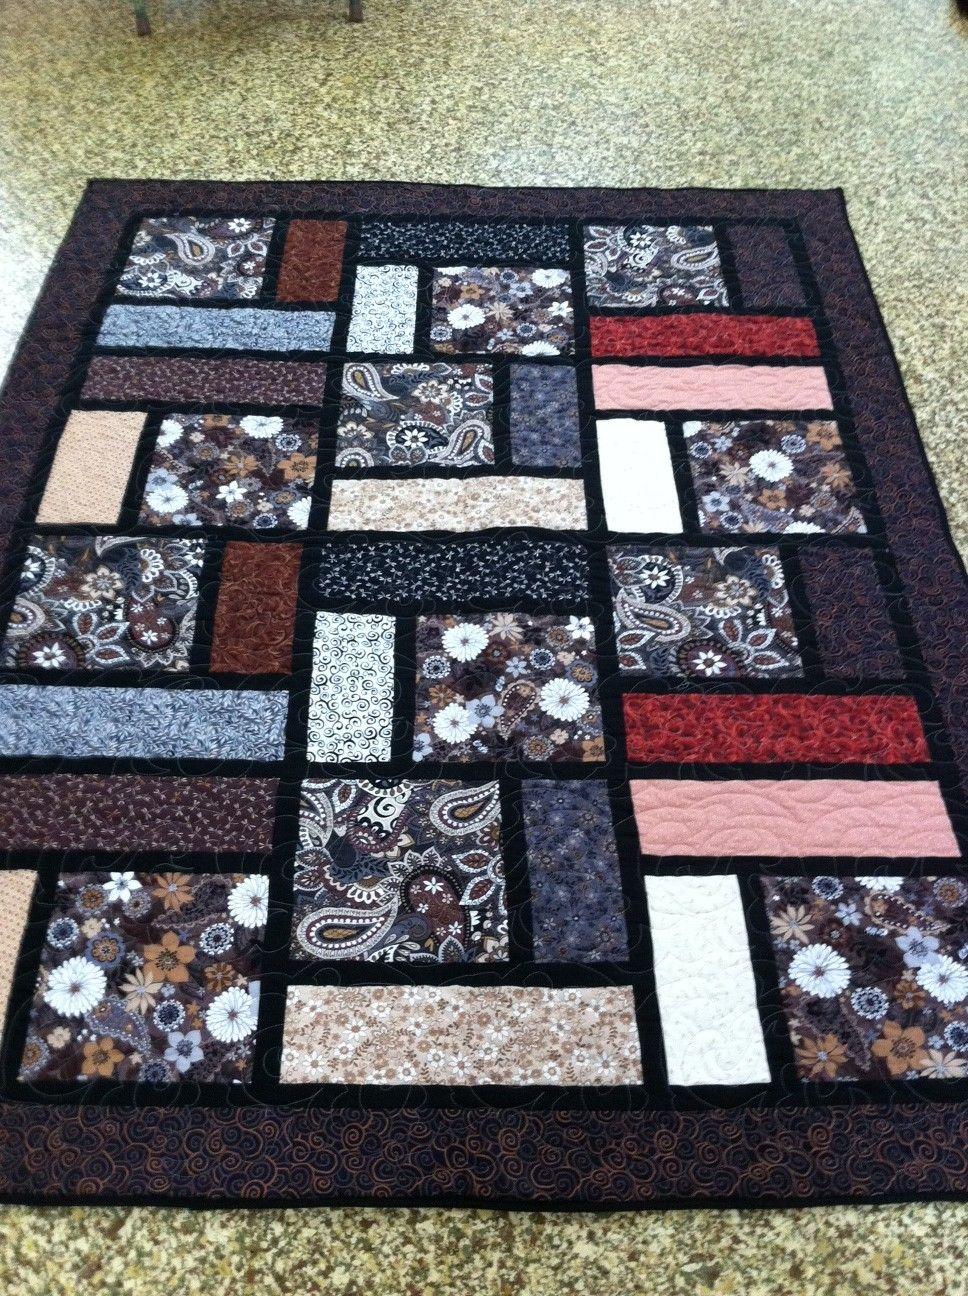 Quilt Patterns For Large Print Fabrics : quilt, patterns, large, print, fabrics, Throw, Quilts,, Block, Quilt, Patterns